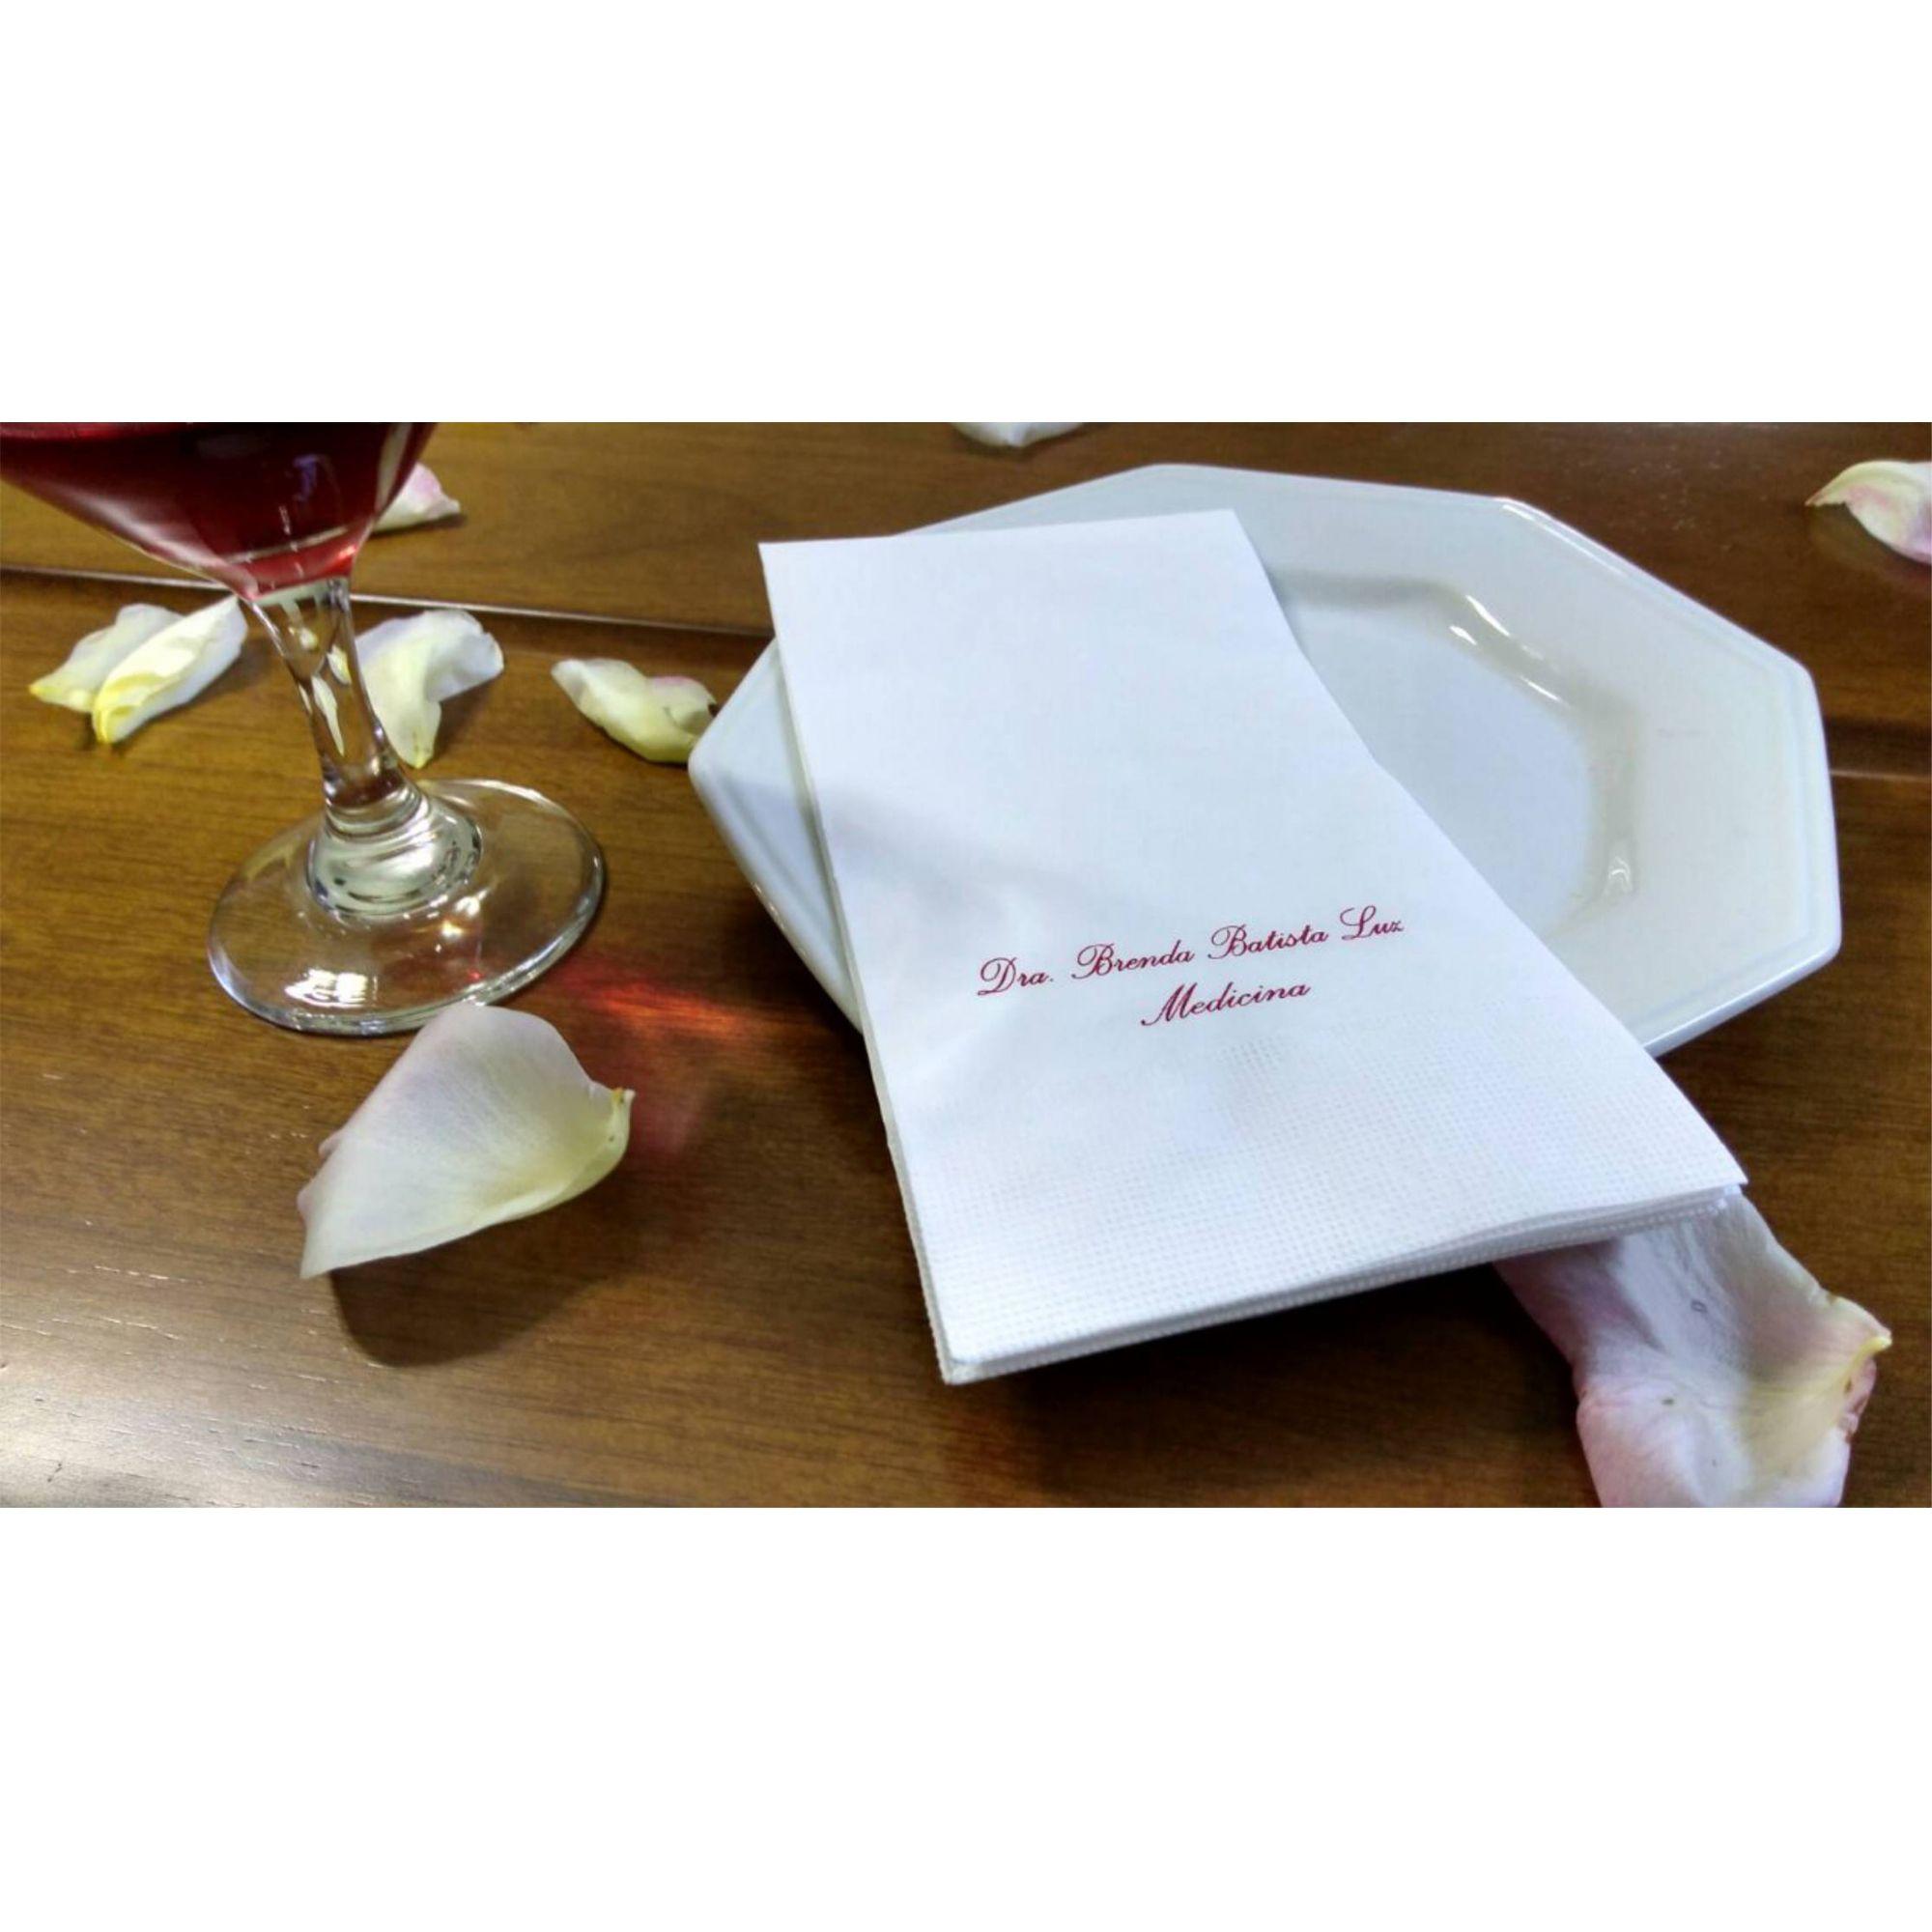 Guardanapo de papel mod. tradicional 40x40 cm Personalizado - 300 unidade  - Persona Guardanapos & Cia